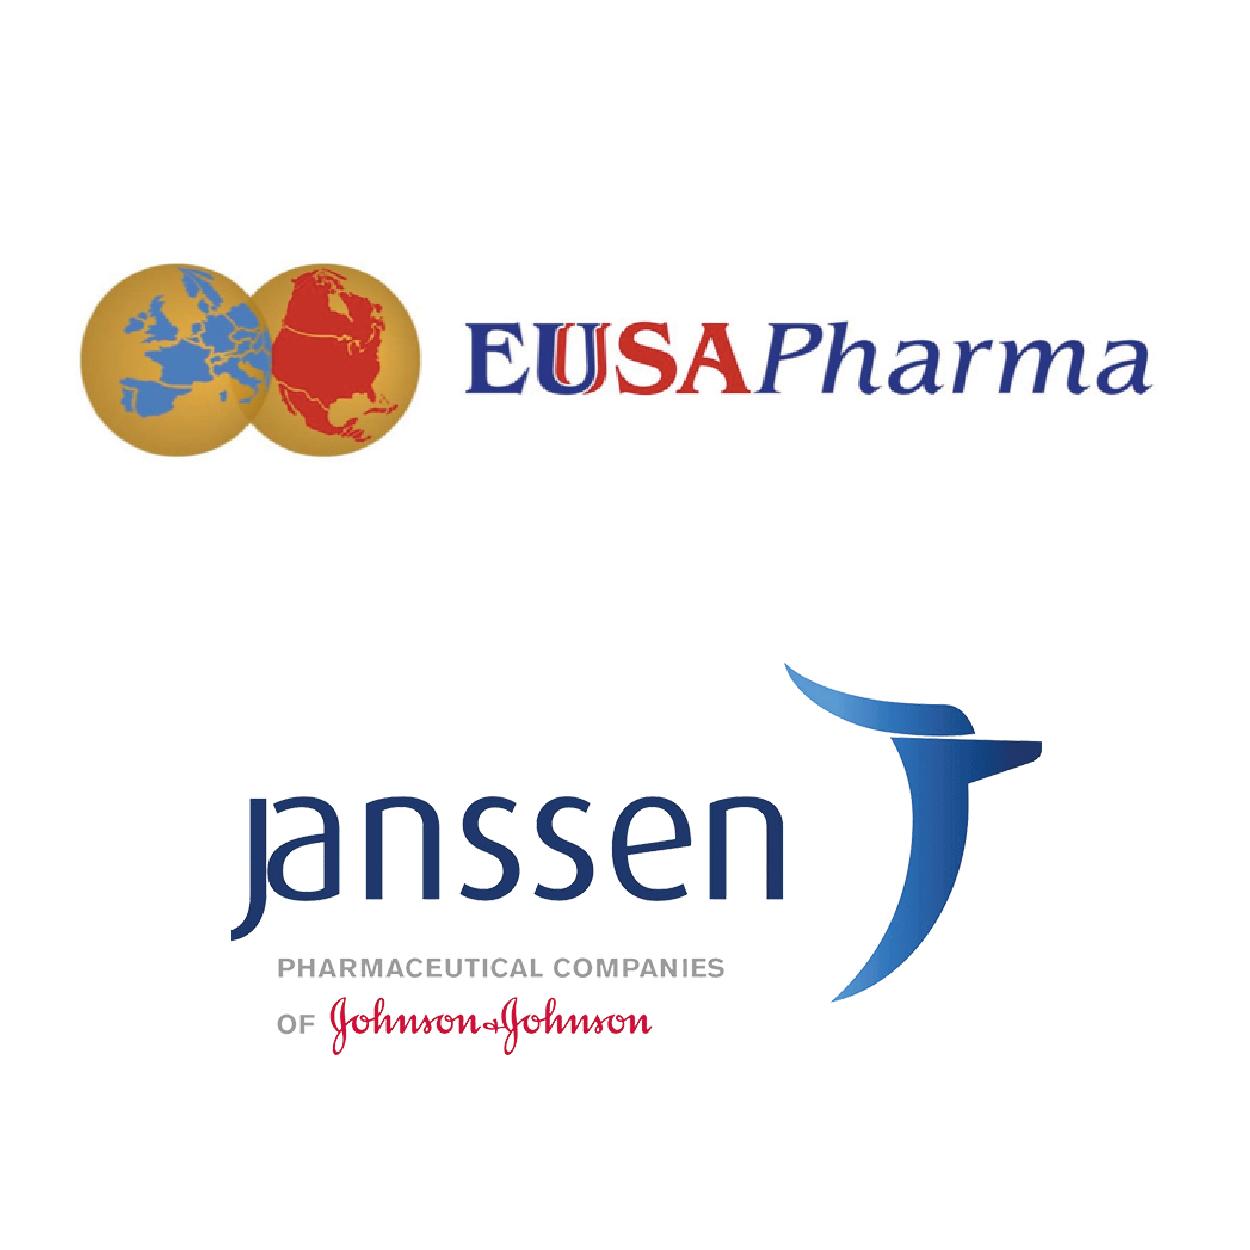 EUSA Pharma and Janssen